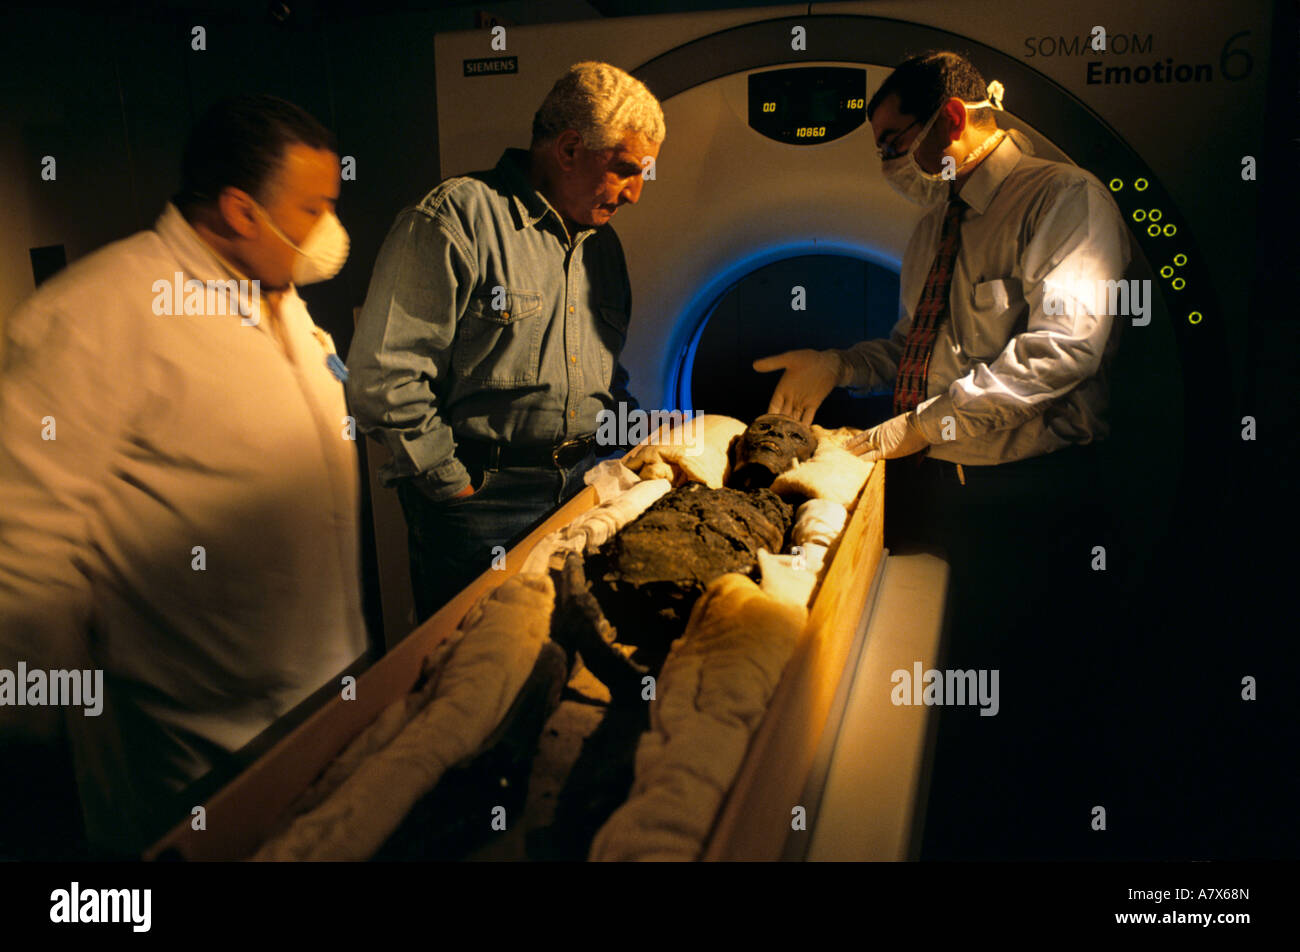 Egypt, CT scan test performed on mummy of Pharaoh Tutankhamun, 18th dynasty, ca 1332-1322, Dr. Zahi Hawass present - Stock Image